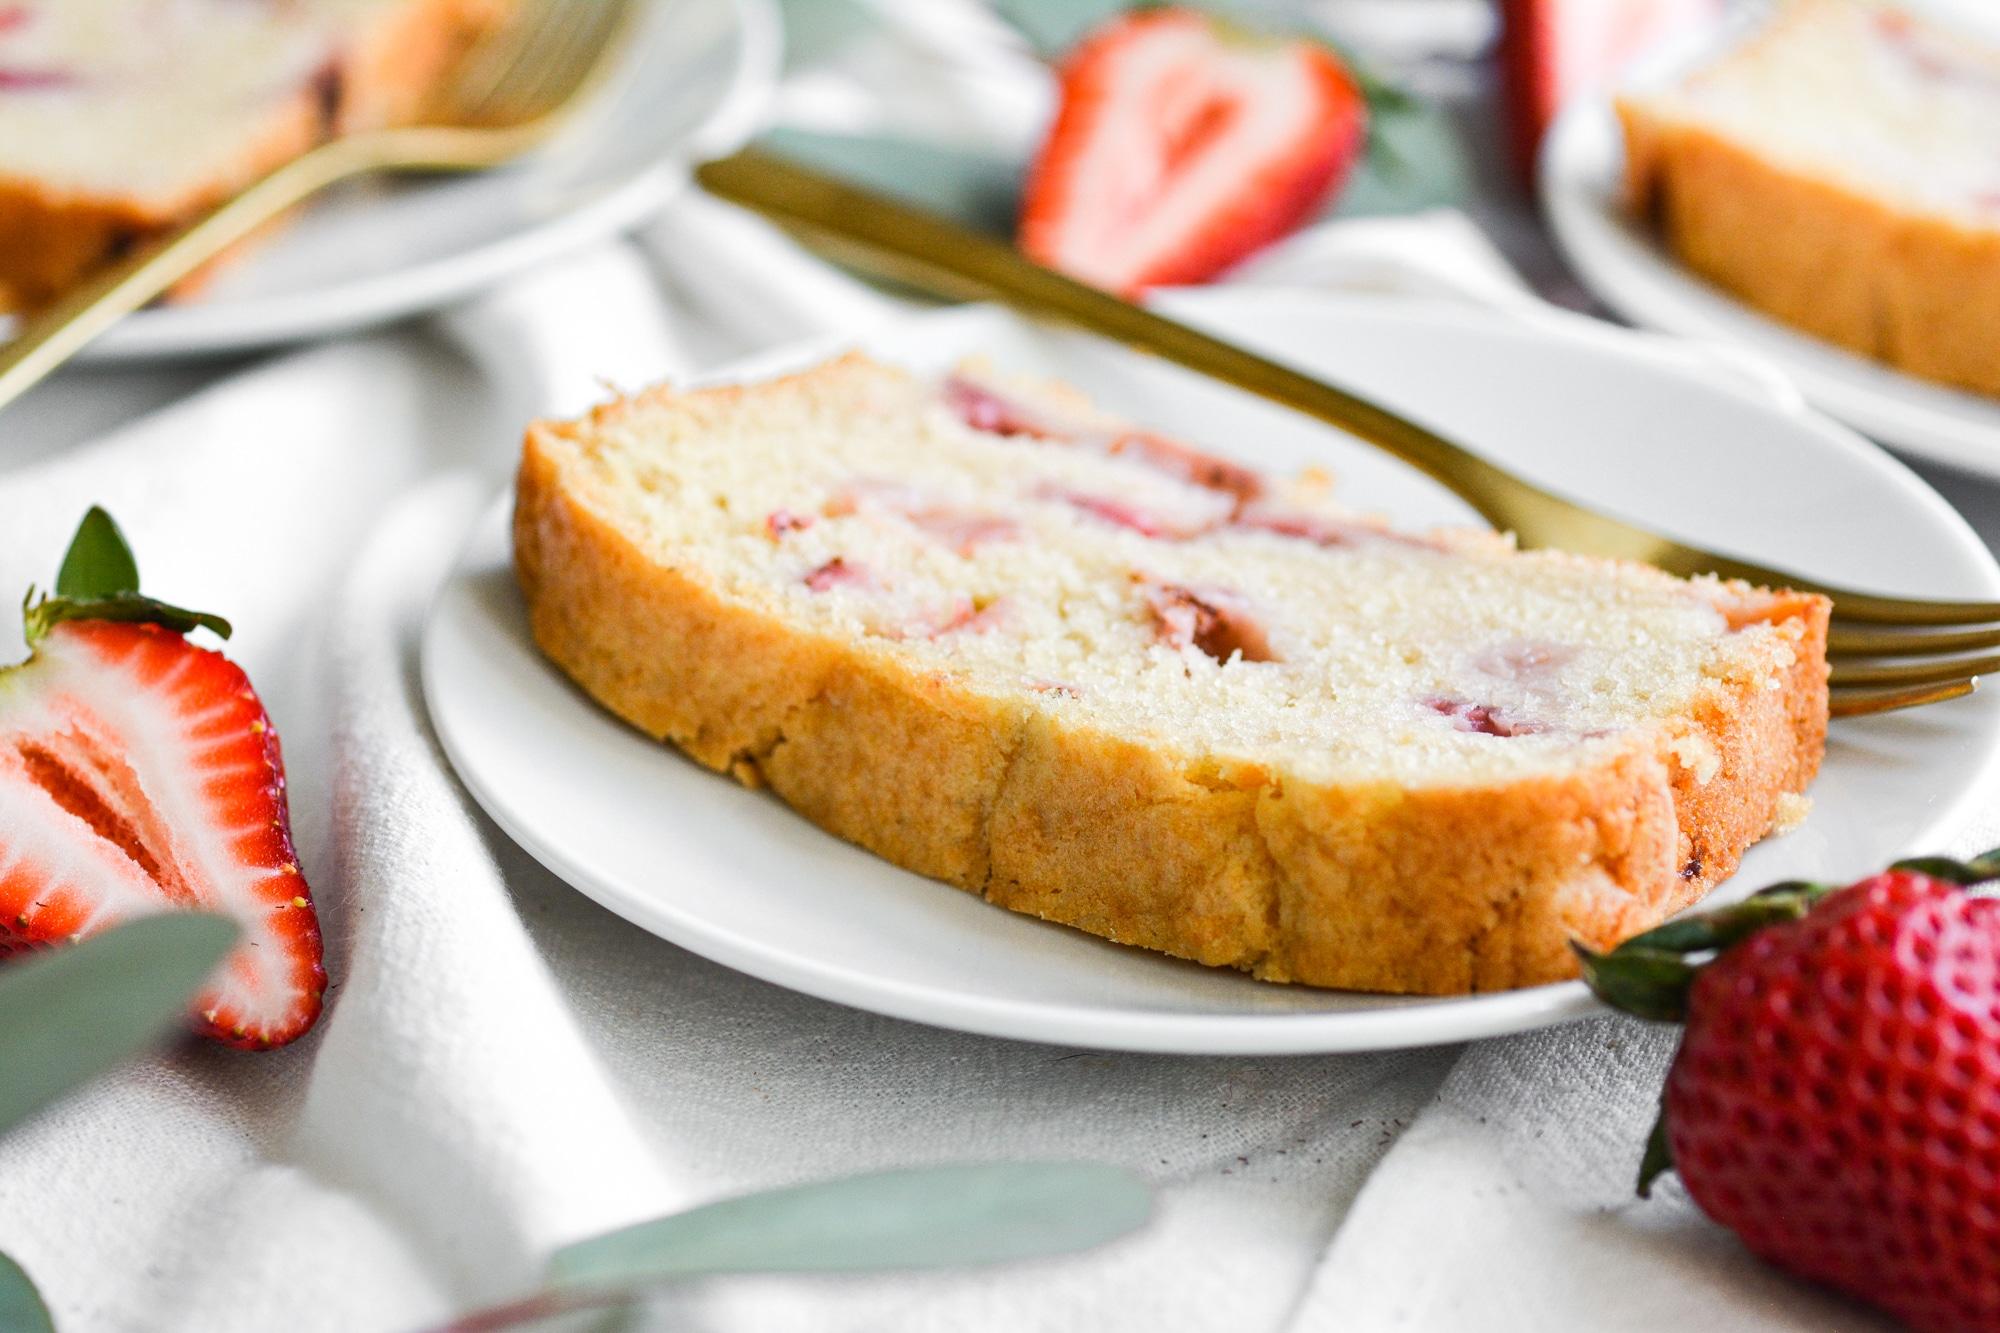 Vegan Strawberry Pound Cake